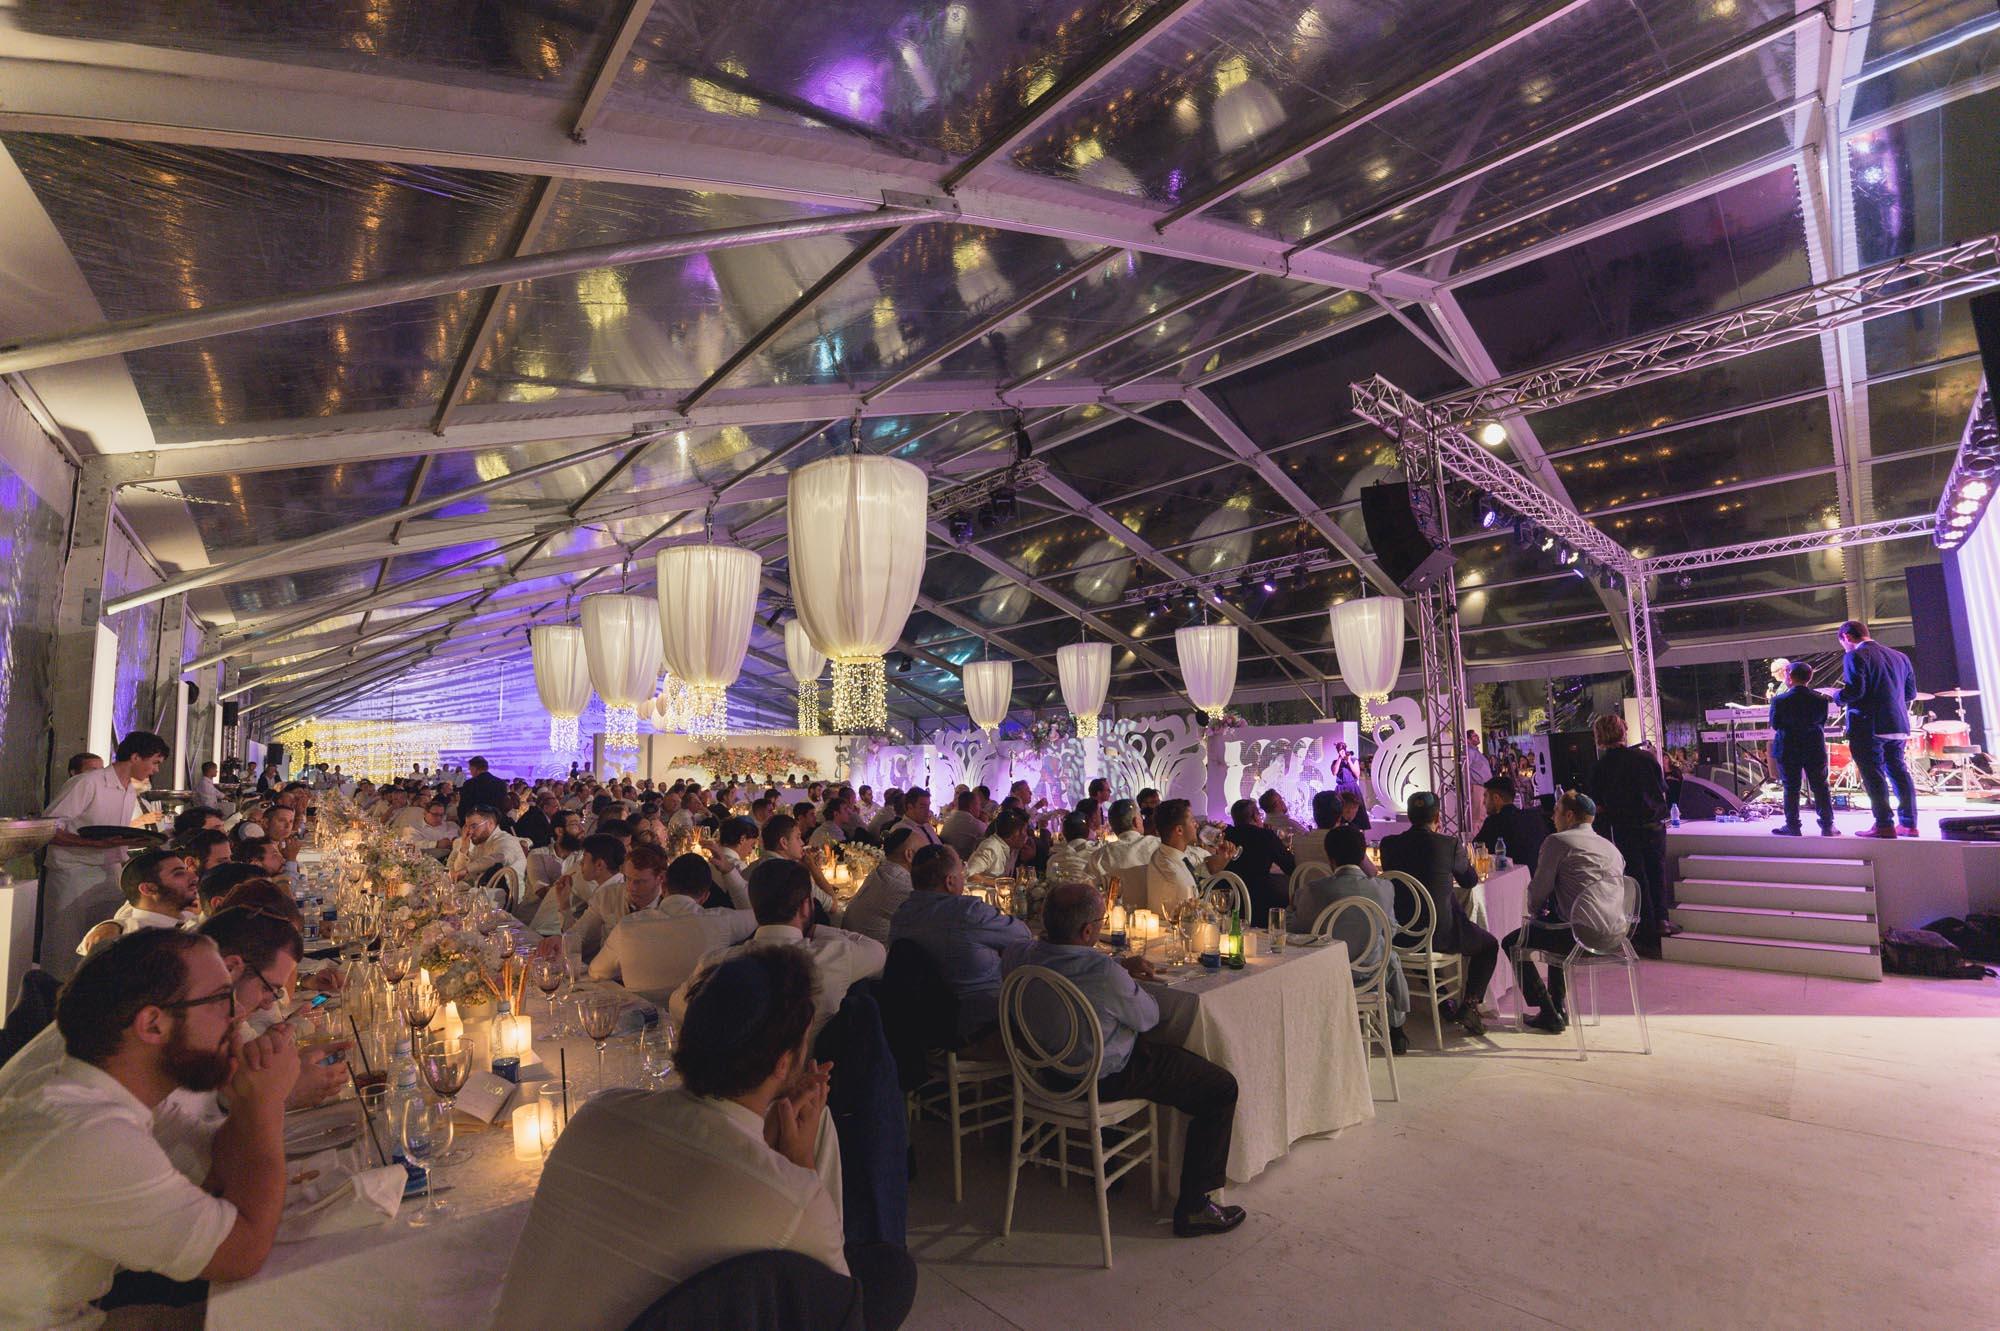 John-henry-wedding-photo-reception-001-22.JPG